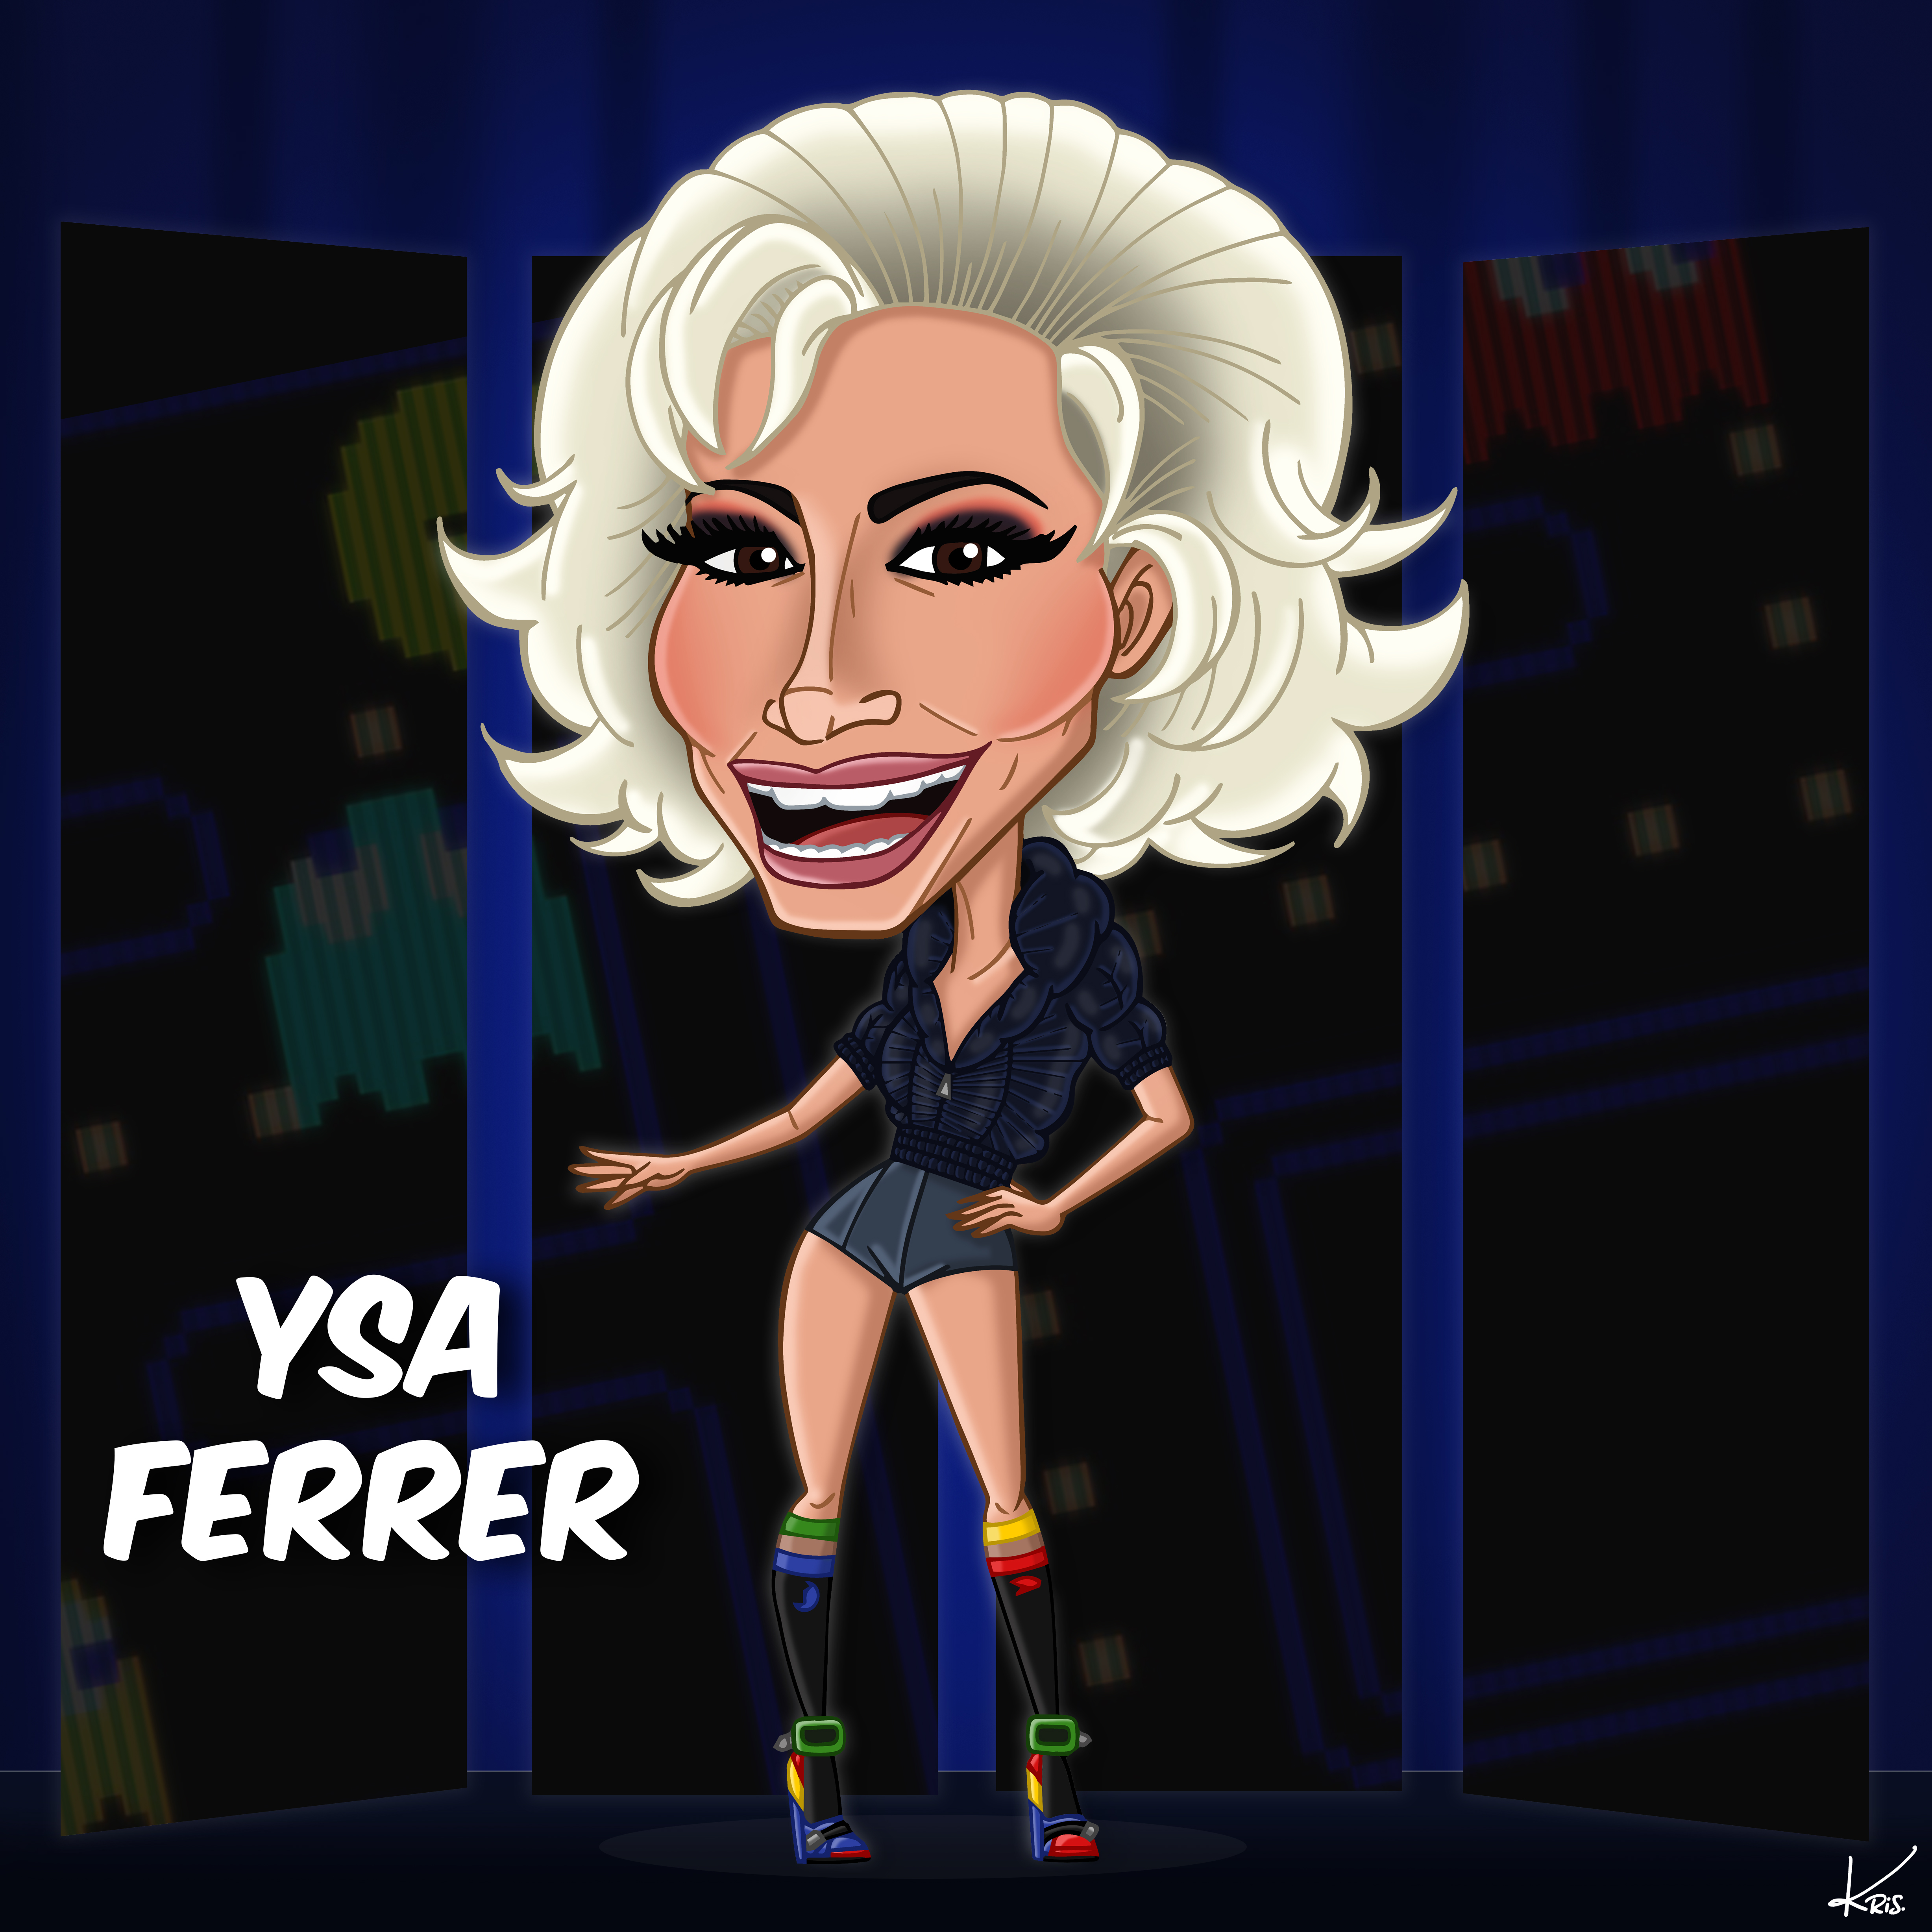 Kris Parenti Ysa Ferrer